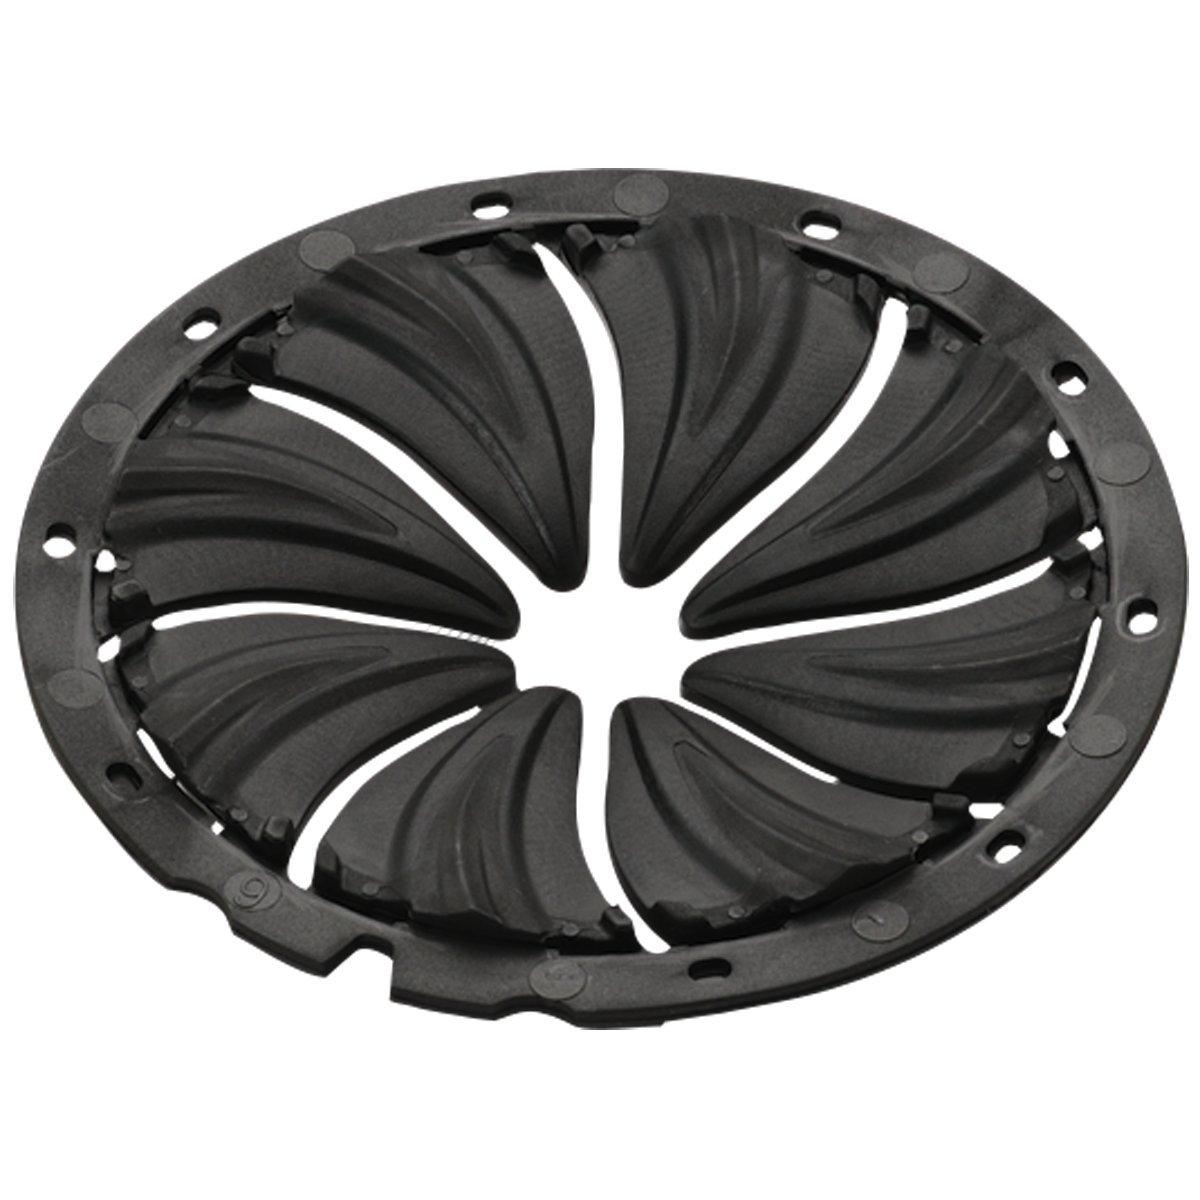 Dye Precision Rotor Loader Quick Feed - Black/Black by Dye